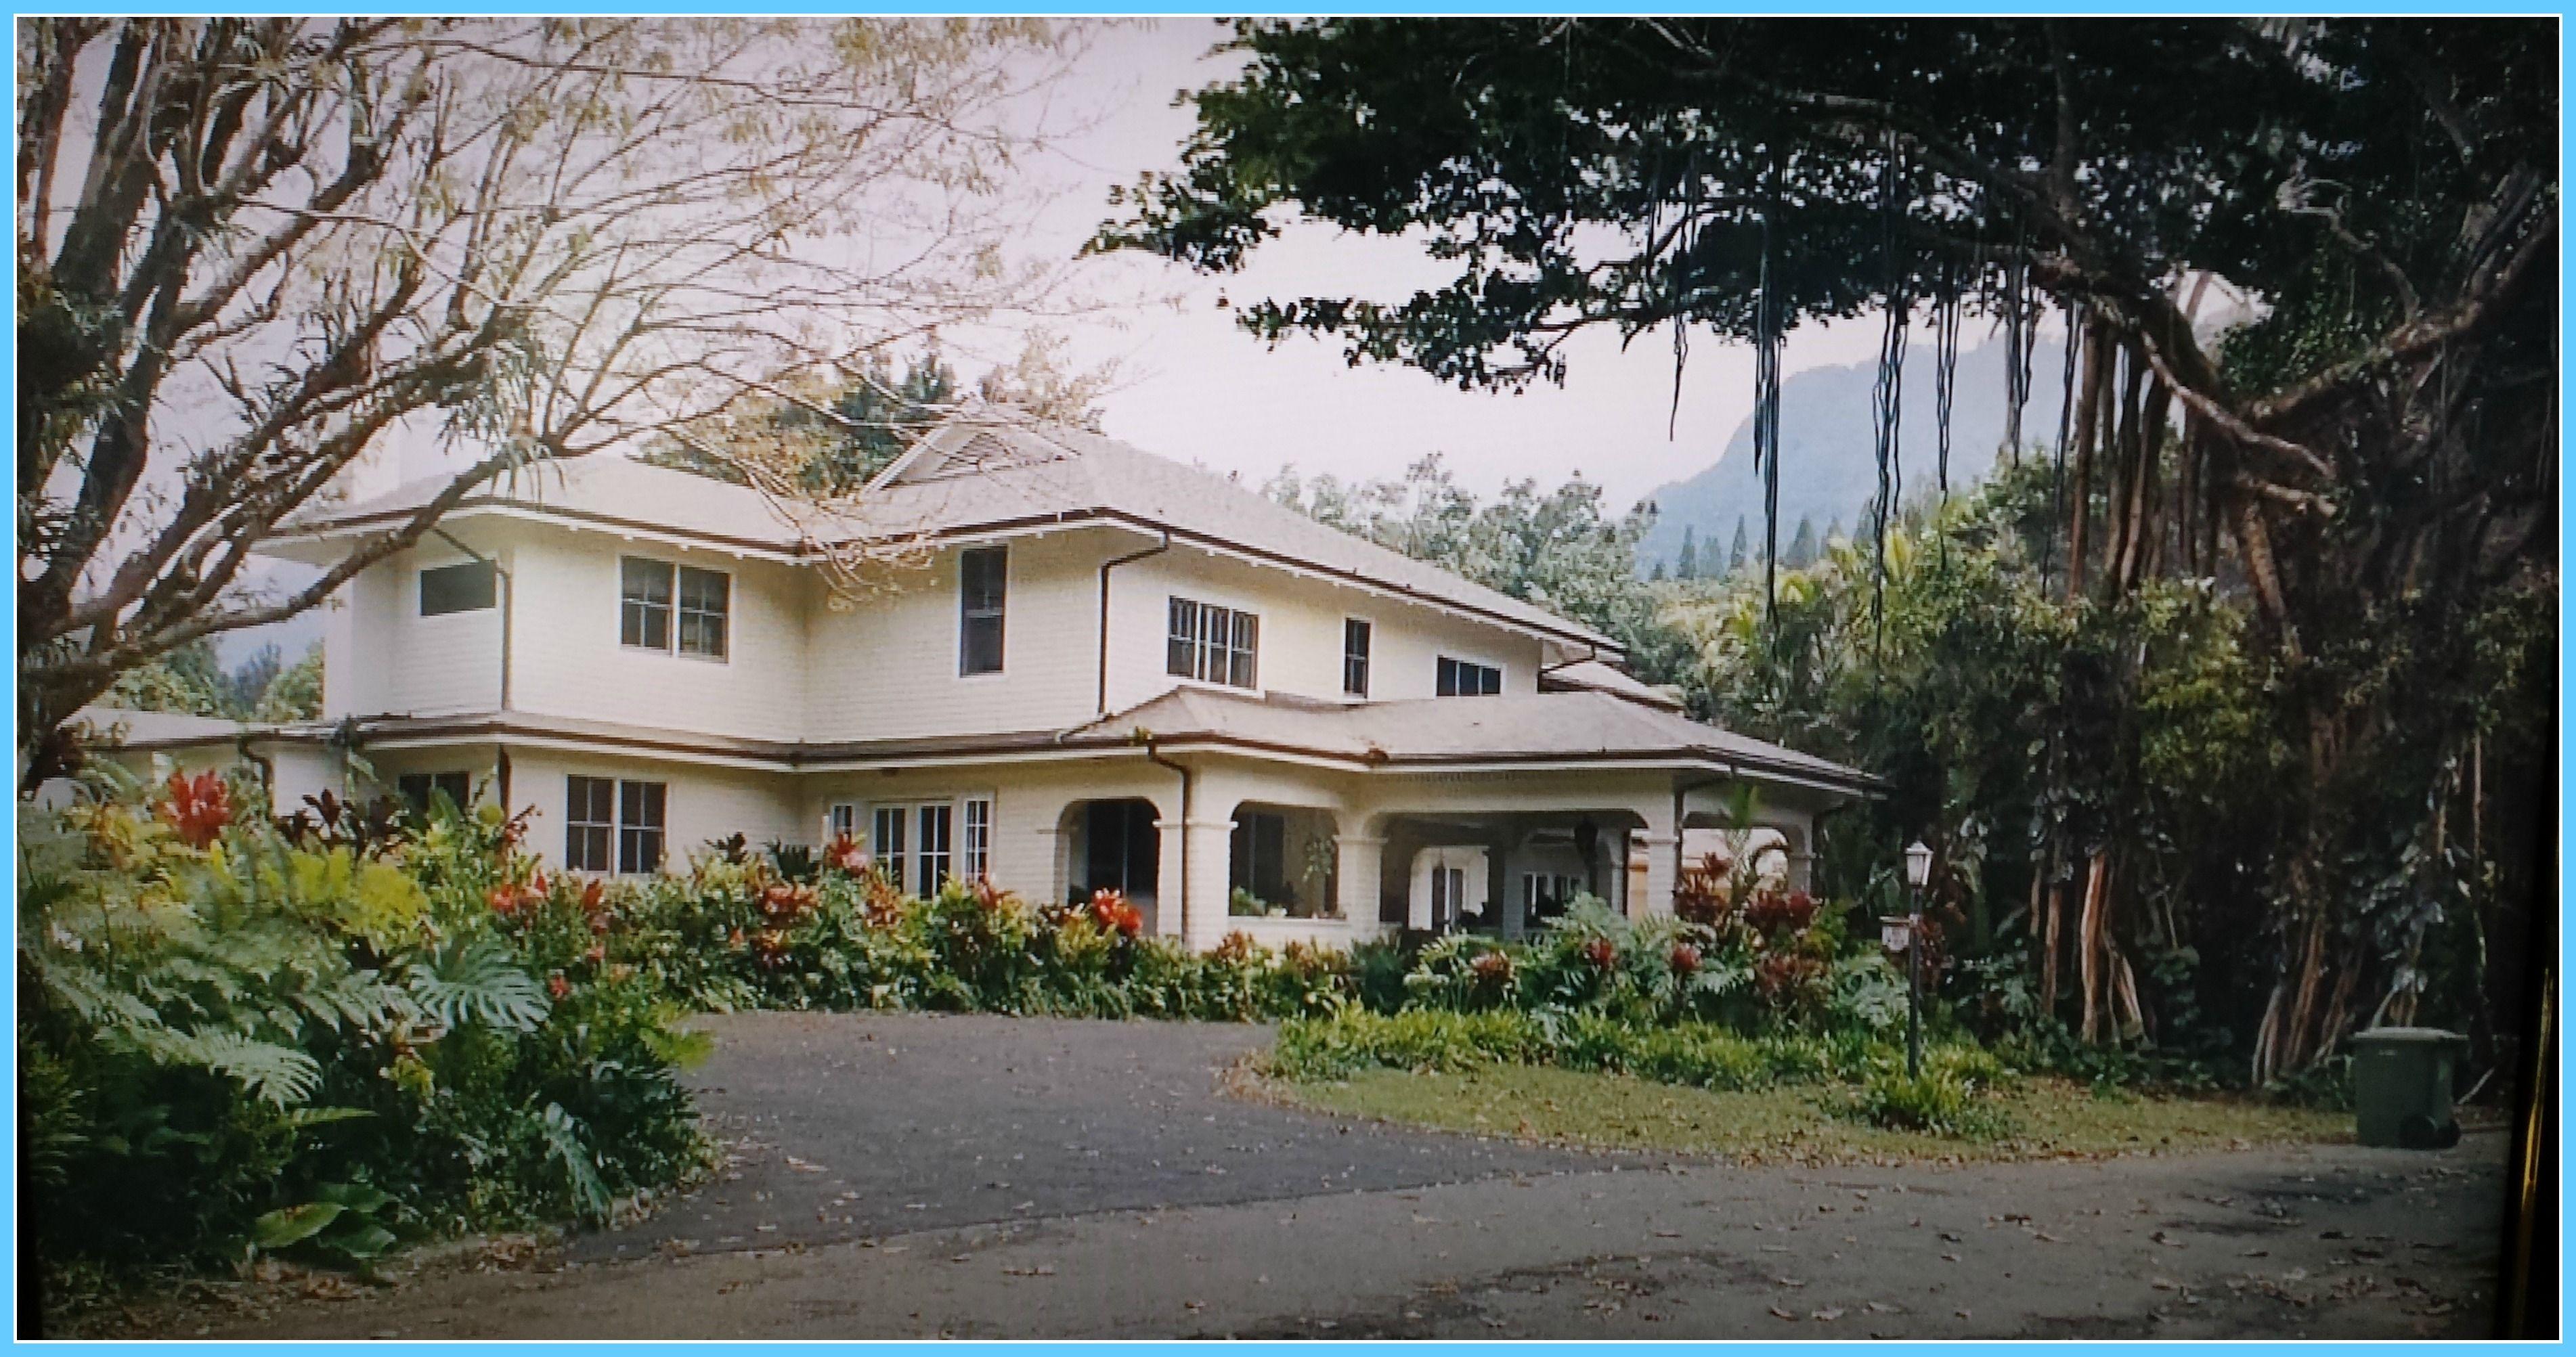 Matt king house as seen in the descendants movie